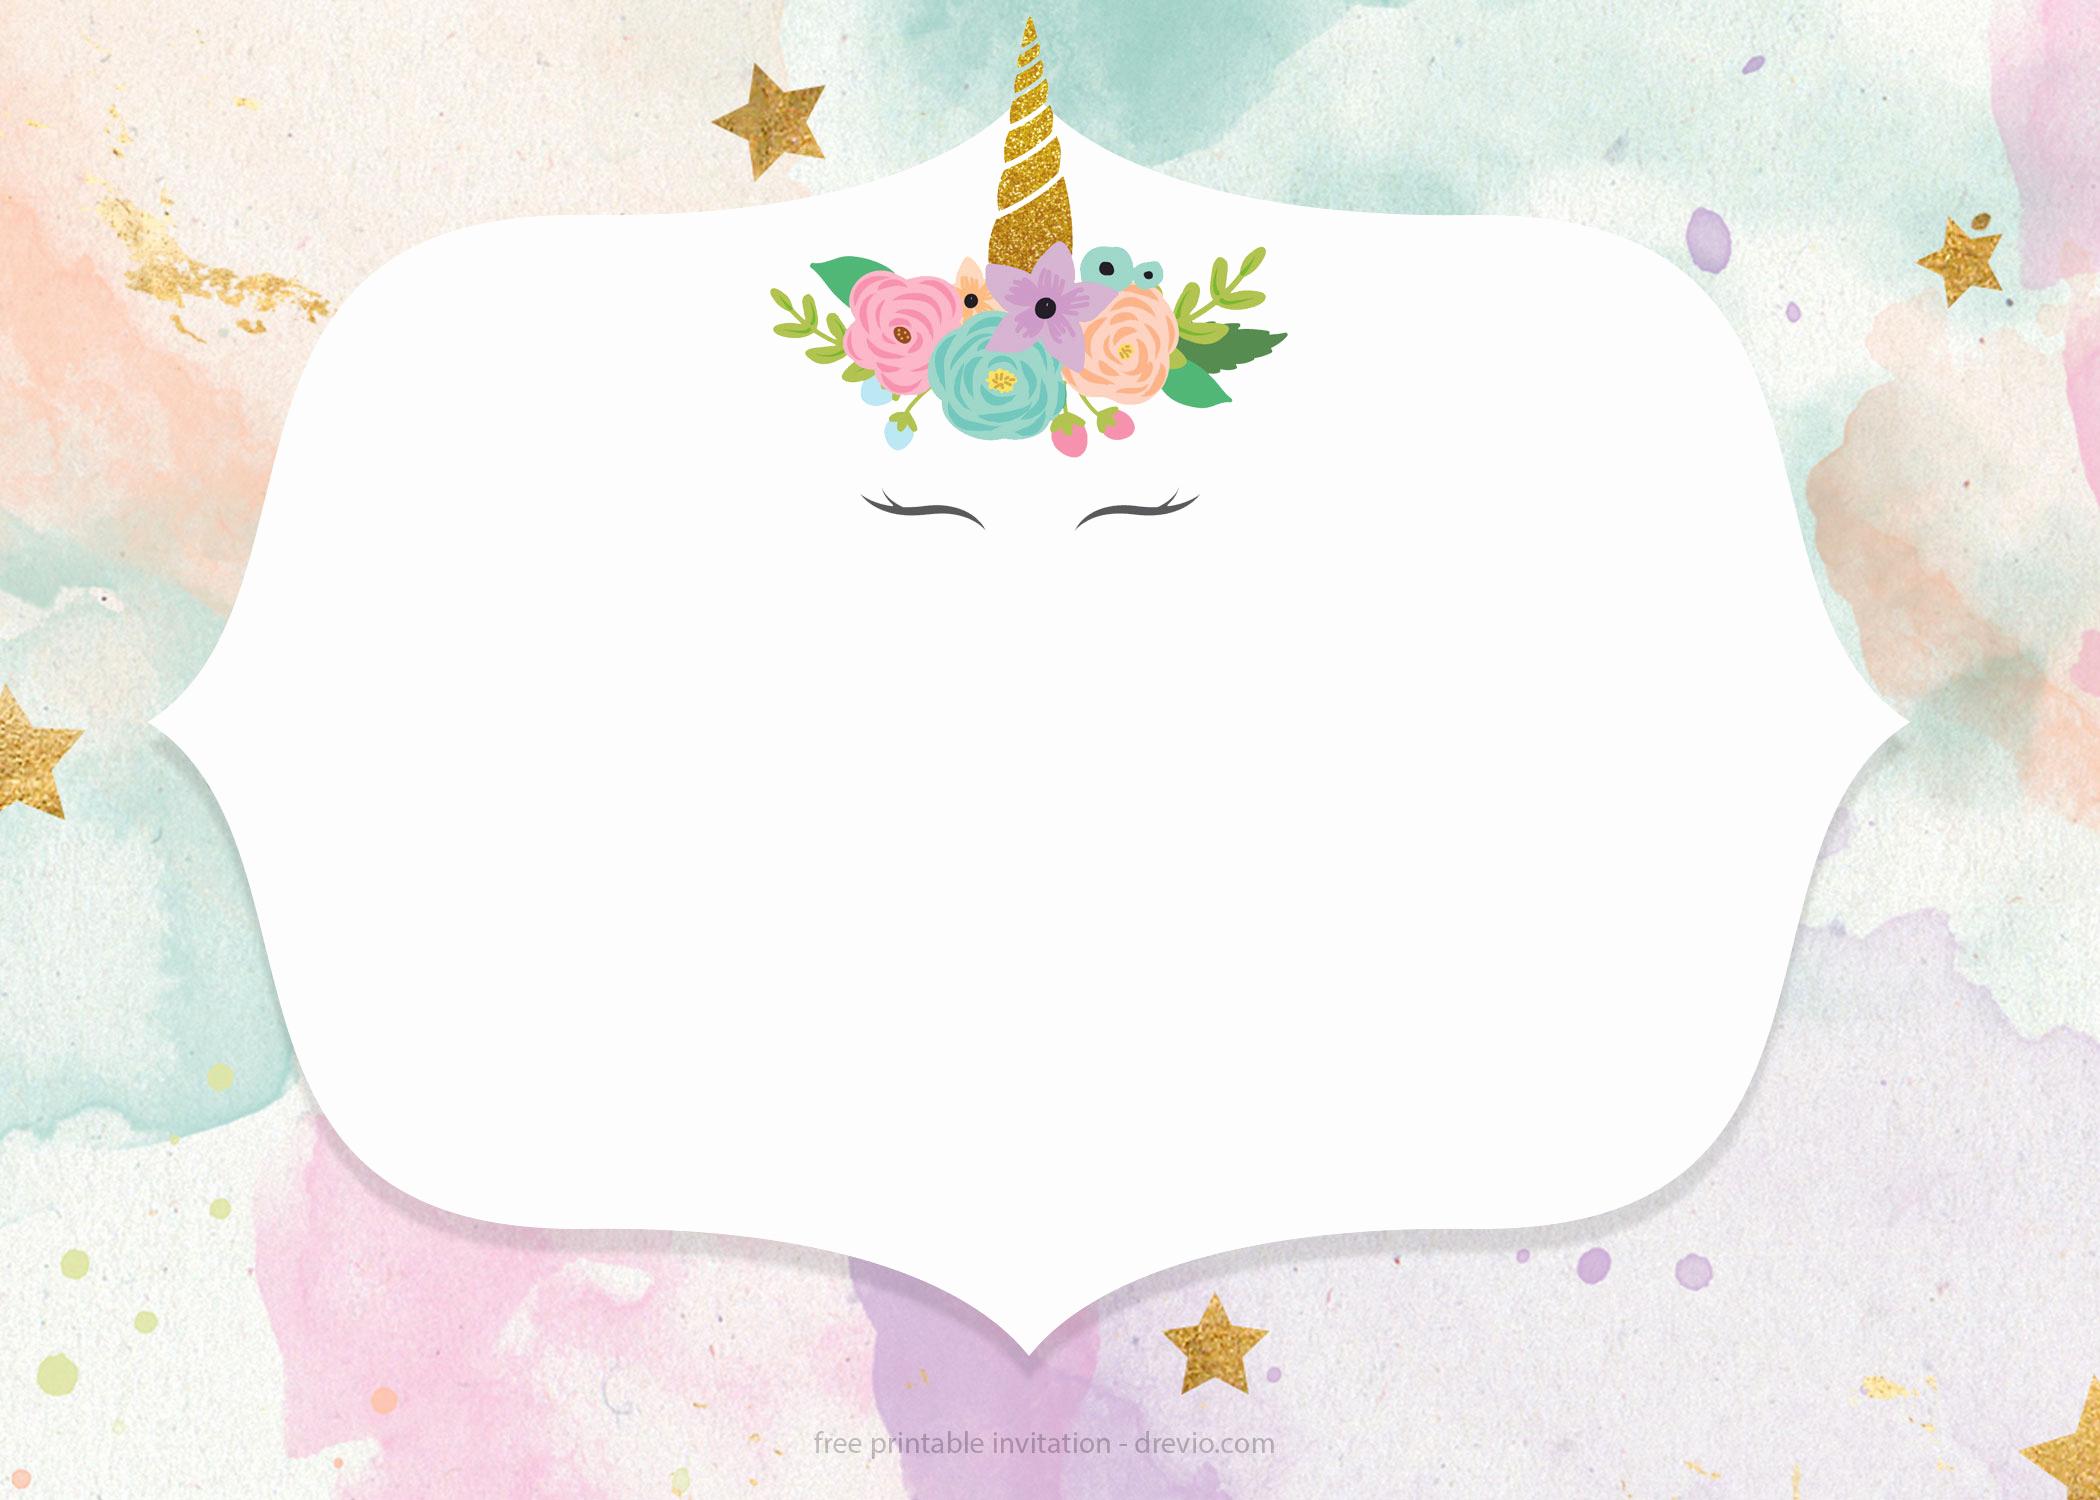 Unicorn Birthday Invitation Template Elegant Free Printable Golden Unicorn Birthday Invitation Template